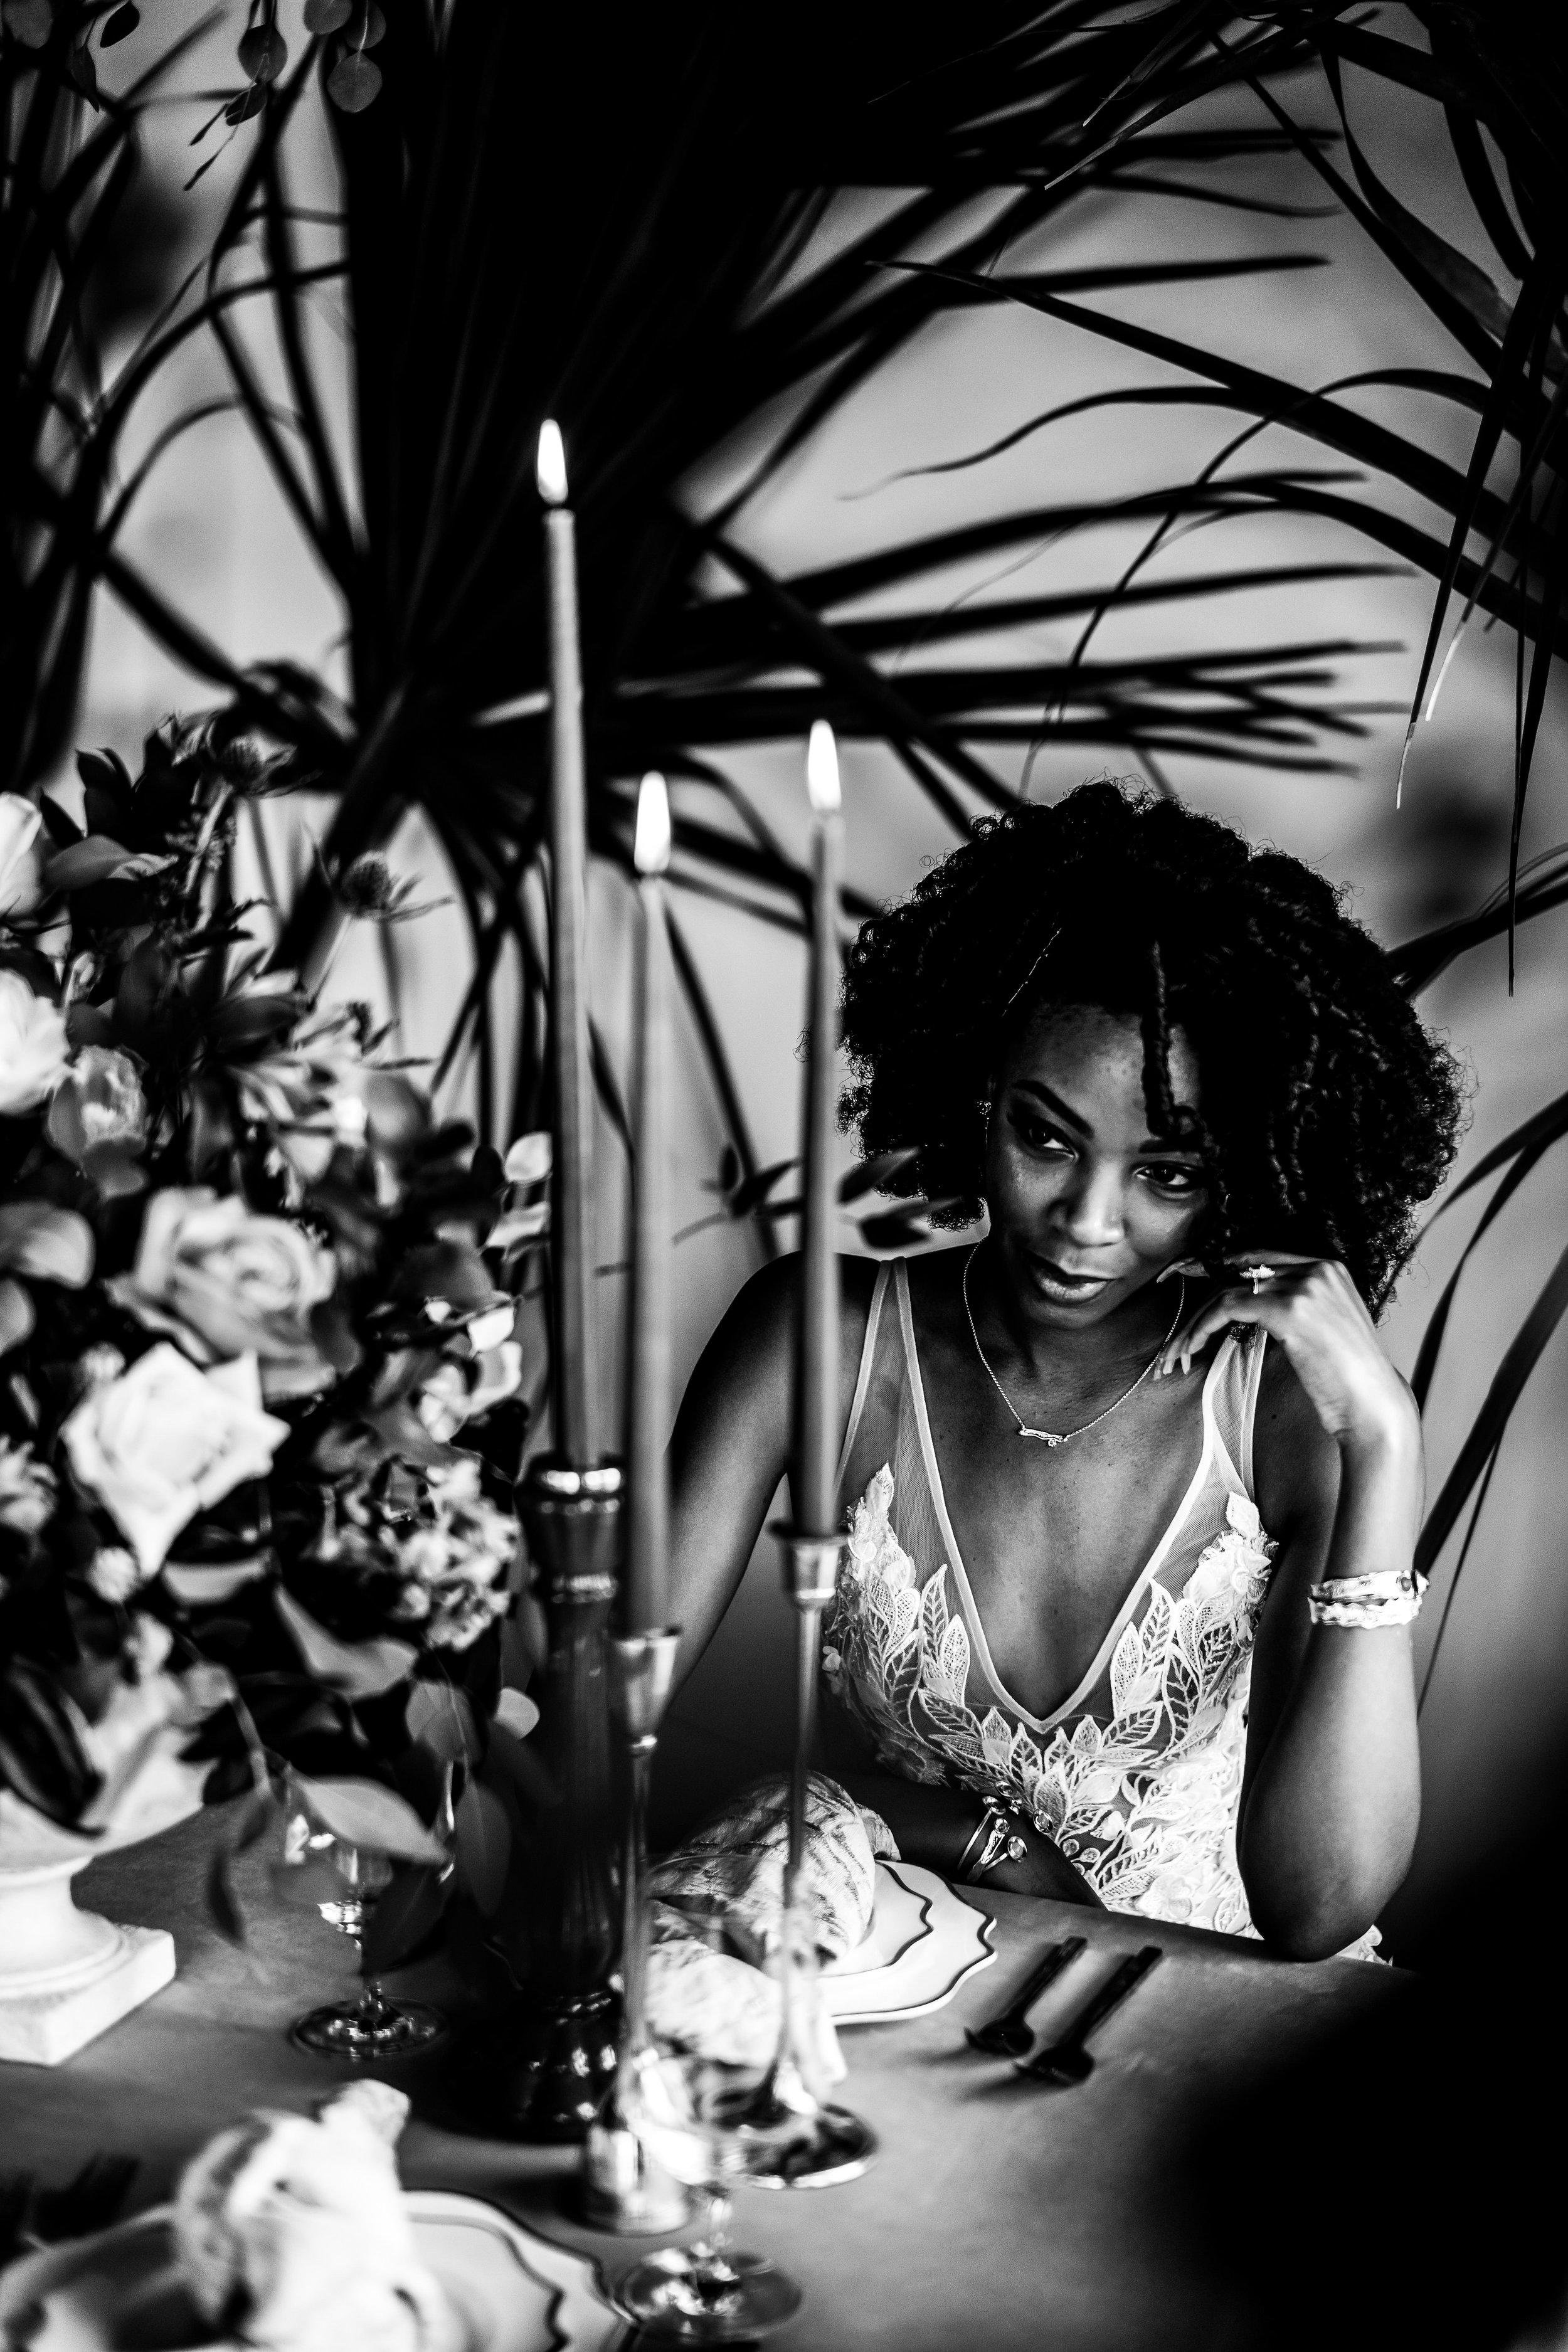 ivory-and-beau-styled-shoot-modern-wedding-inspo-classic-southern-wedding-chic-savannah-gerogia-photographer-savannah-georiga-bakery-savannah-georiga-wedding-planner-savannah-georgia-stylist-savannah-georgia-wedding-florist